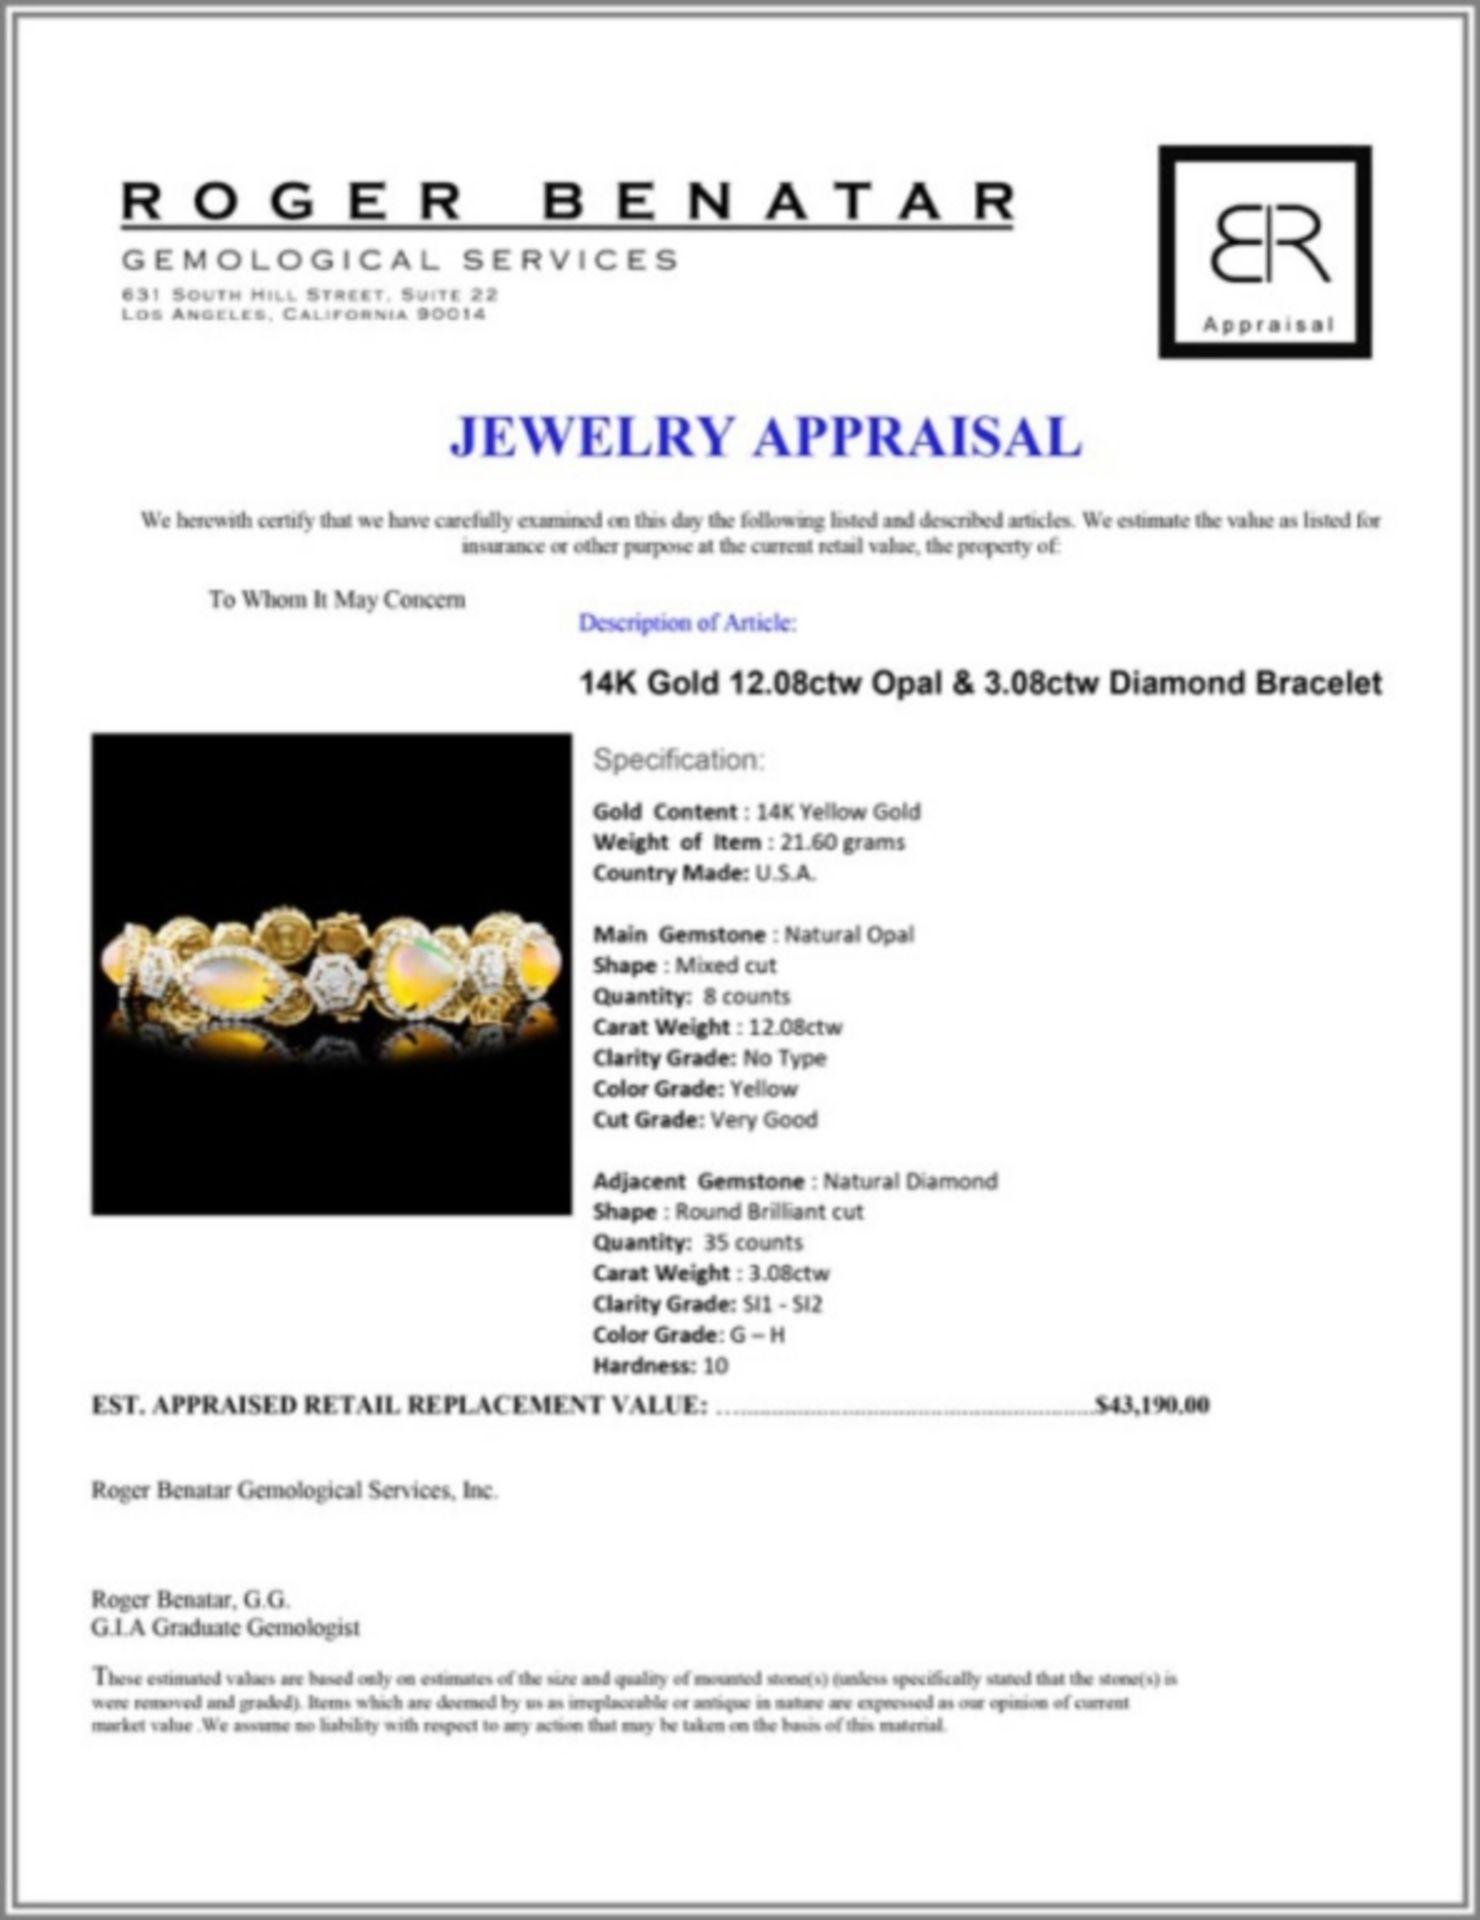 14K Gold 12.08ctw Opal & 3.08ctw Diamond Bracelet - Image 3 of 3